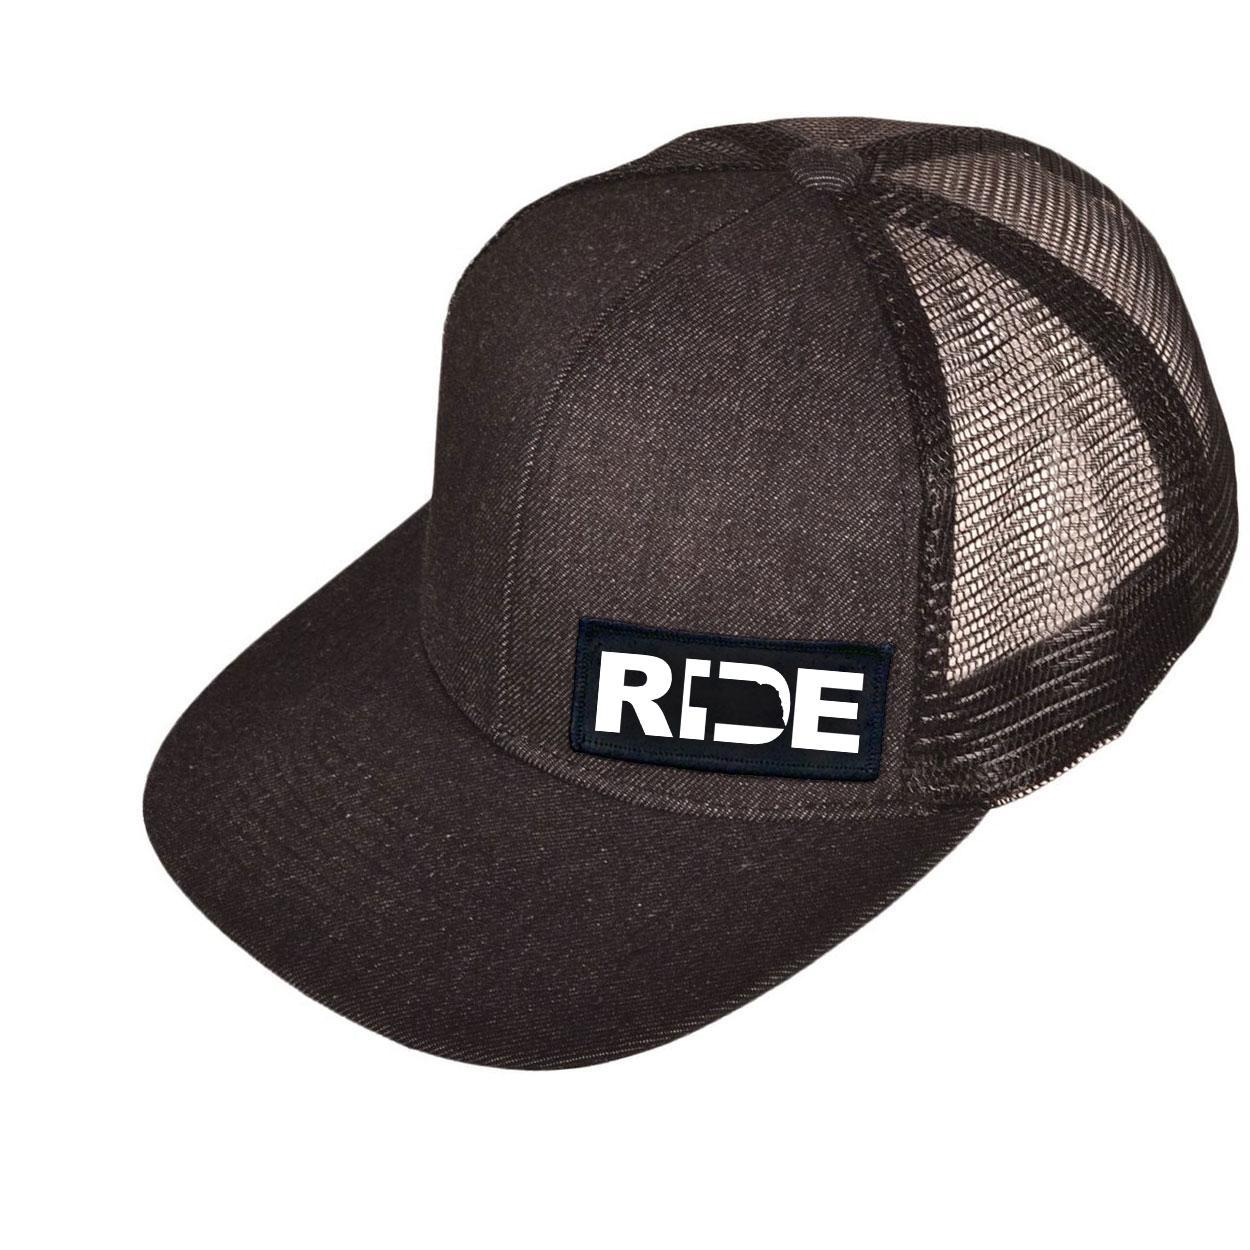 Ride Nebraska Night Out Woven Patch Snapback Flat Brim Hat Black Denim (White Logo)